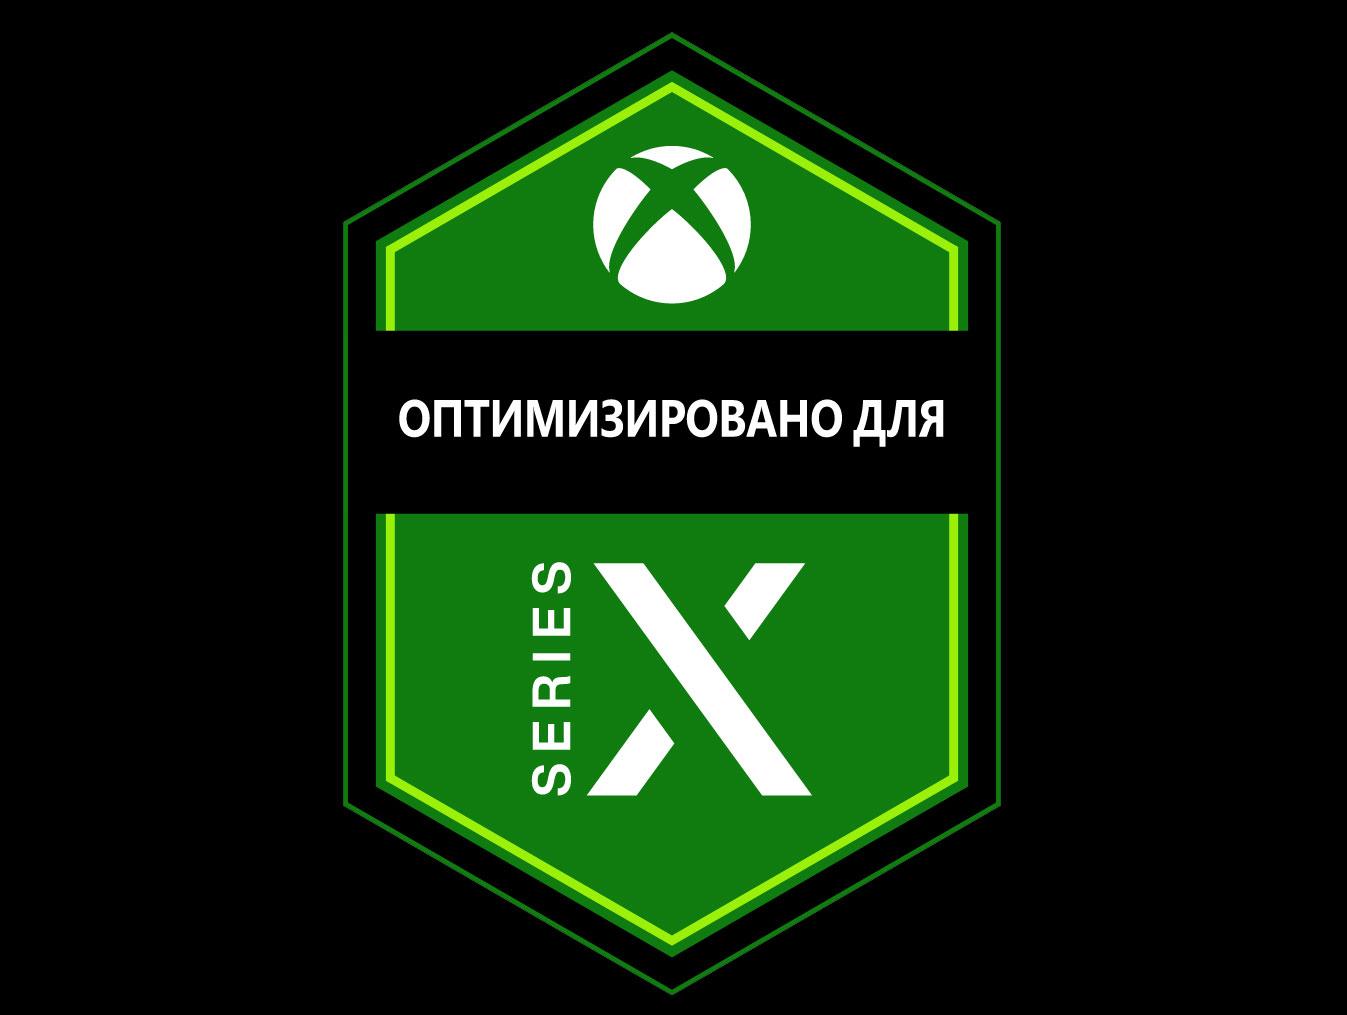 Microsoft выпустила видеонарезку игр, оптимизированных для Xbox Series X